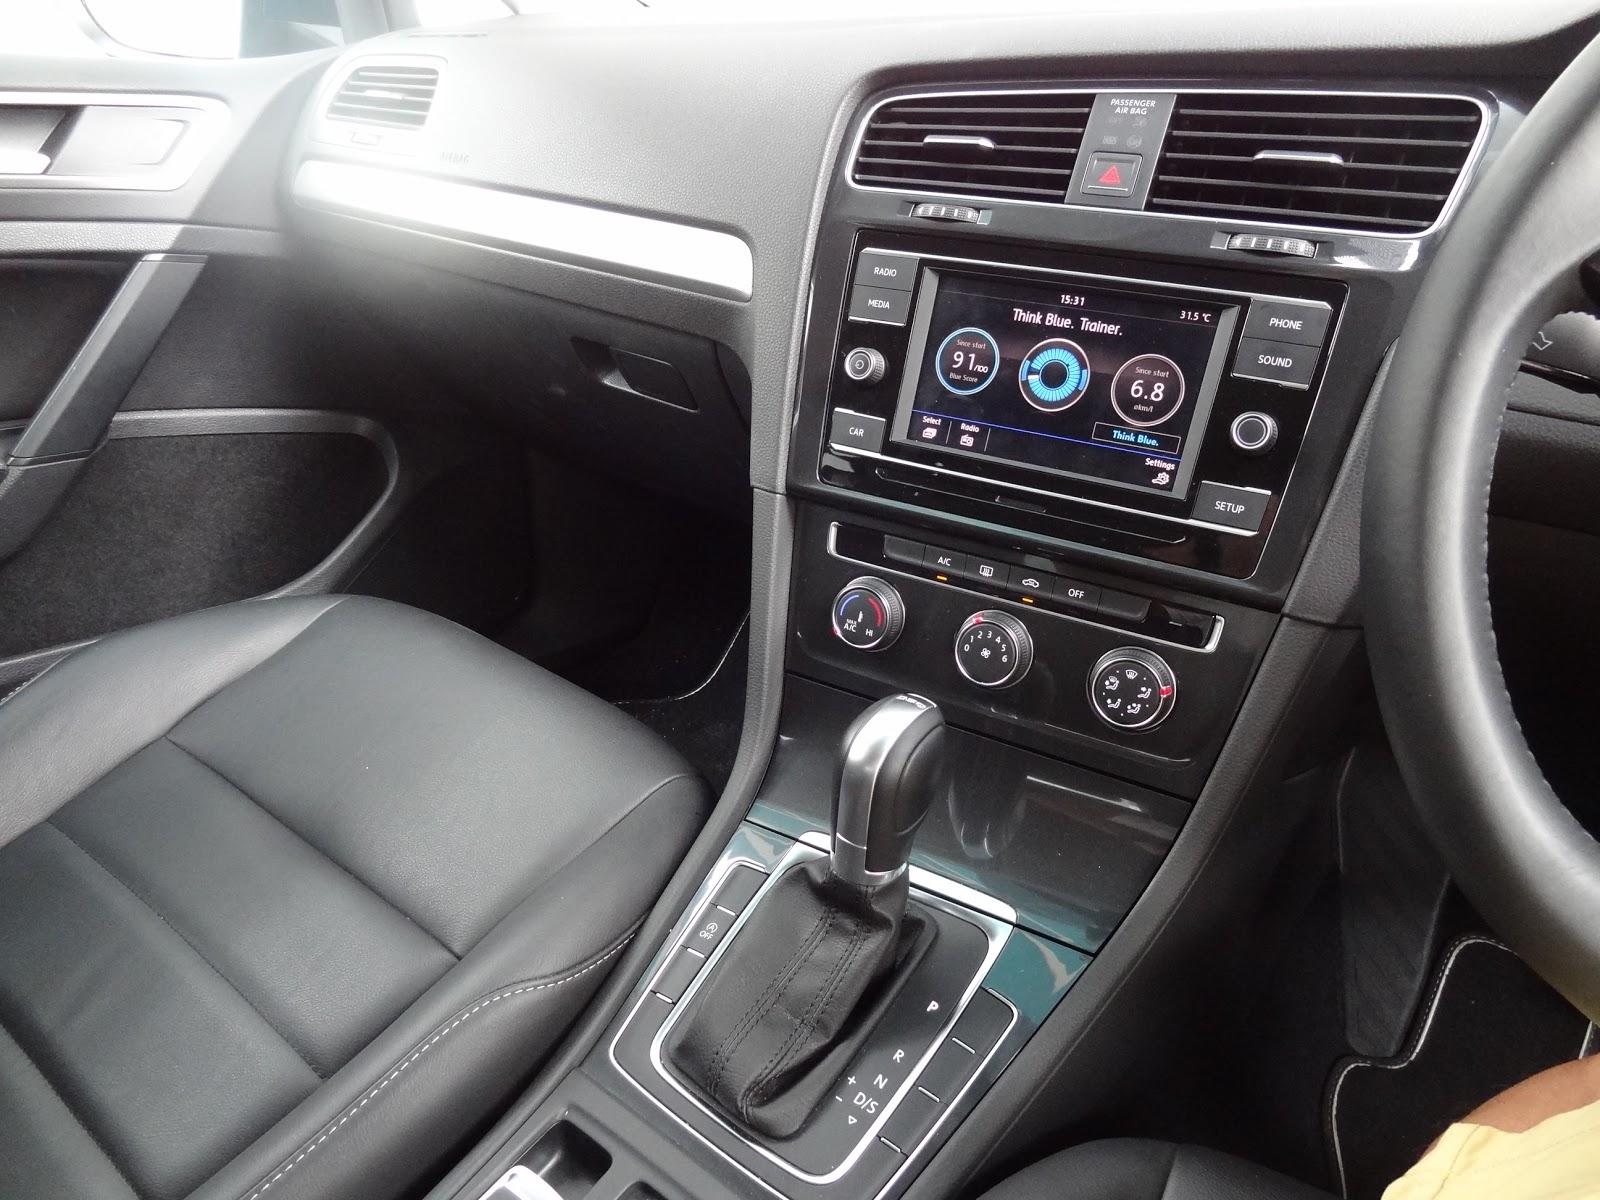 Shaun Owyeong: Volkswagen Golf TSI 1 0L (2018) [Car Review]